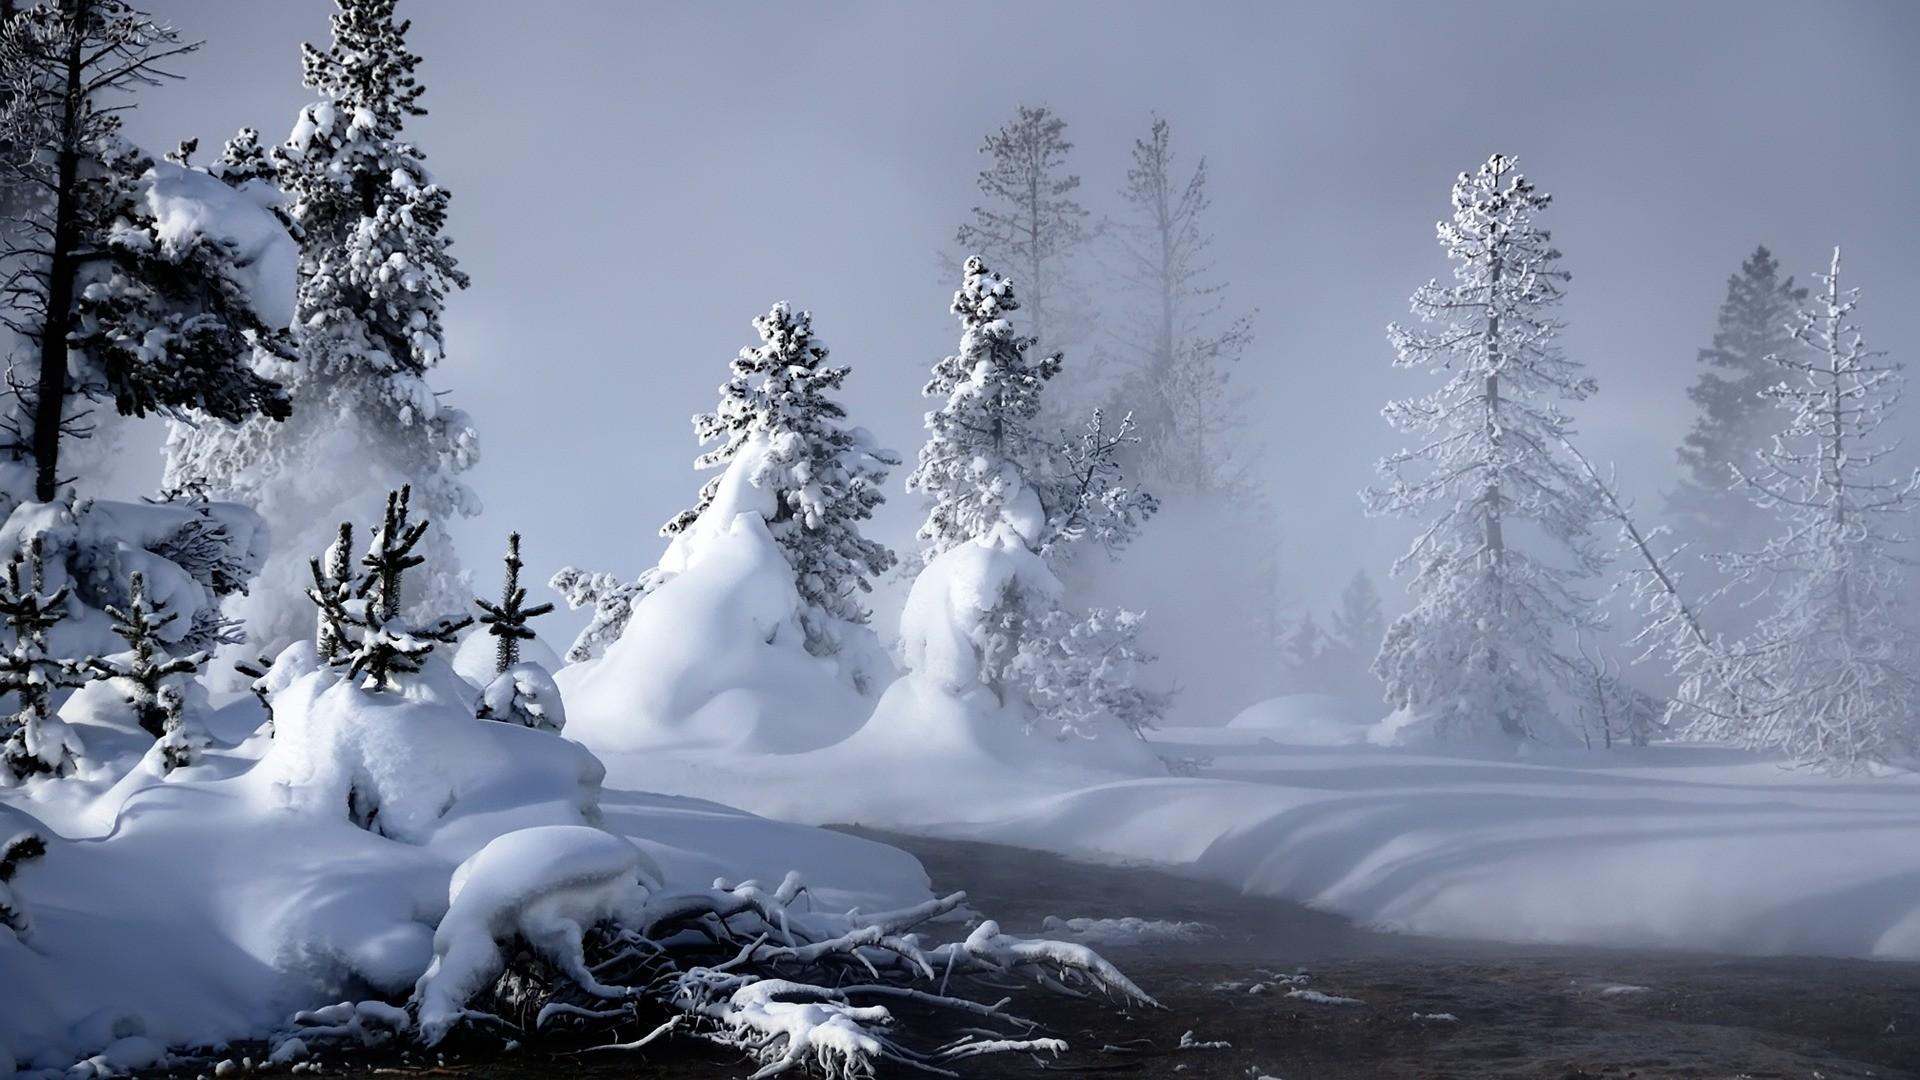 … mystic winter wallpaper winter nature wallpapers in jpg format for …